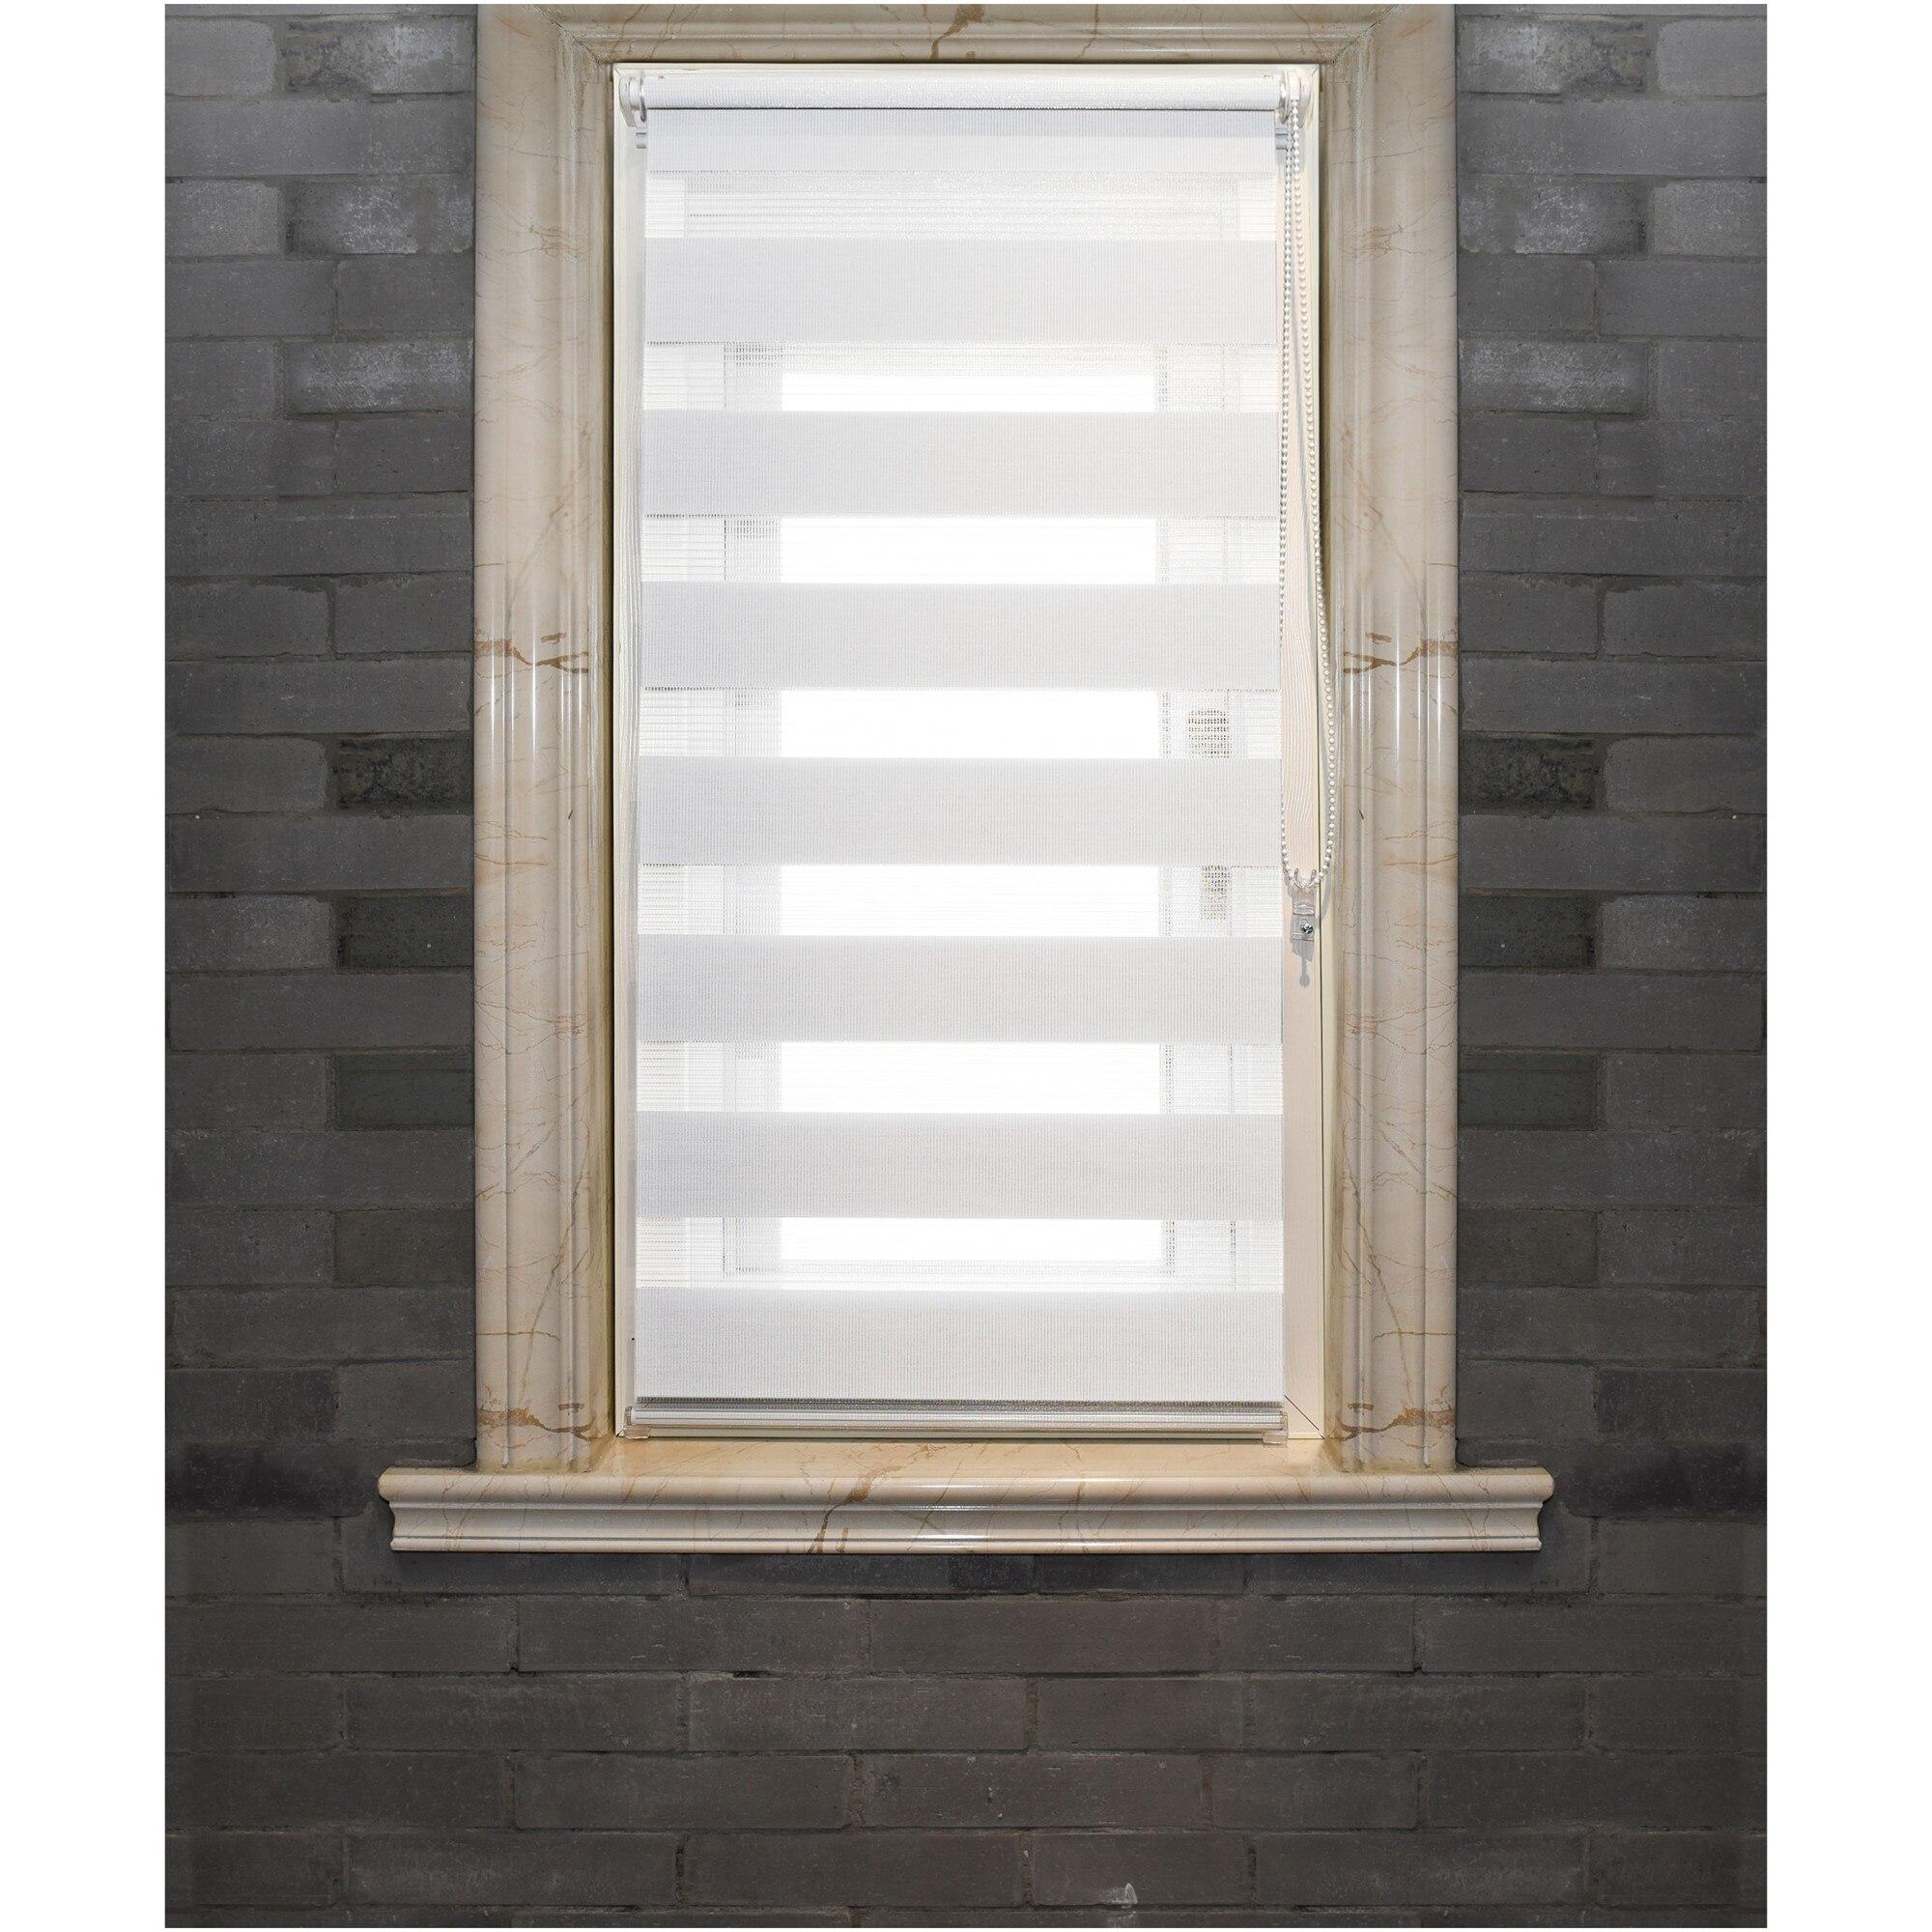 Fotografie Rulou textil zebra Kring, 100% poliester, 120 gsm , 60x150 cm, Alb